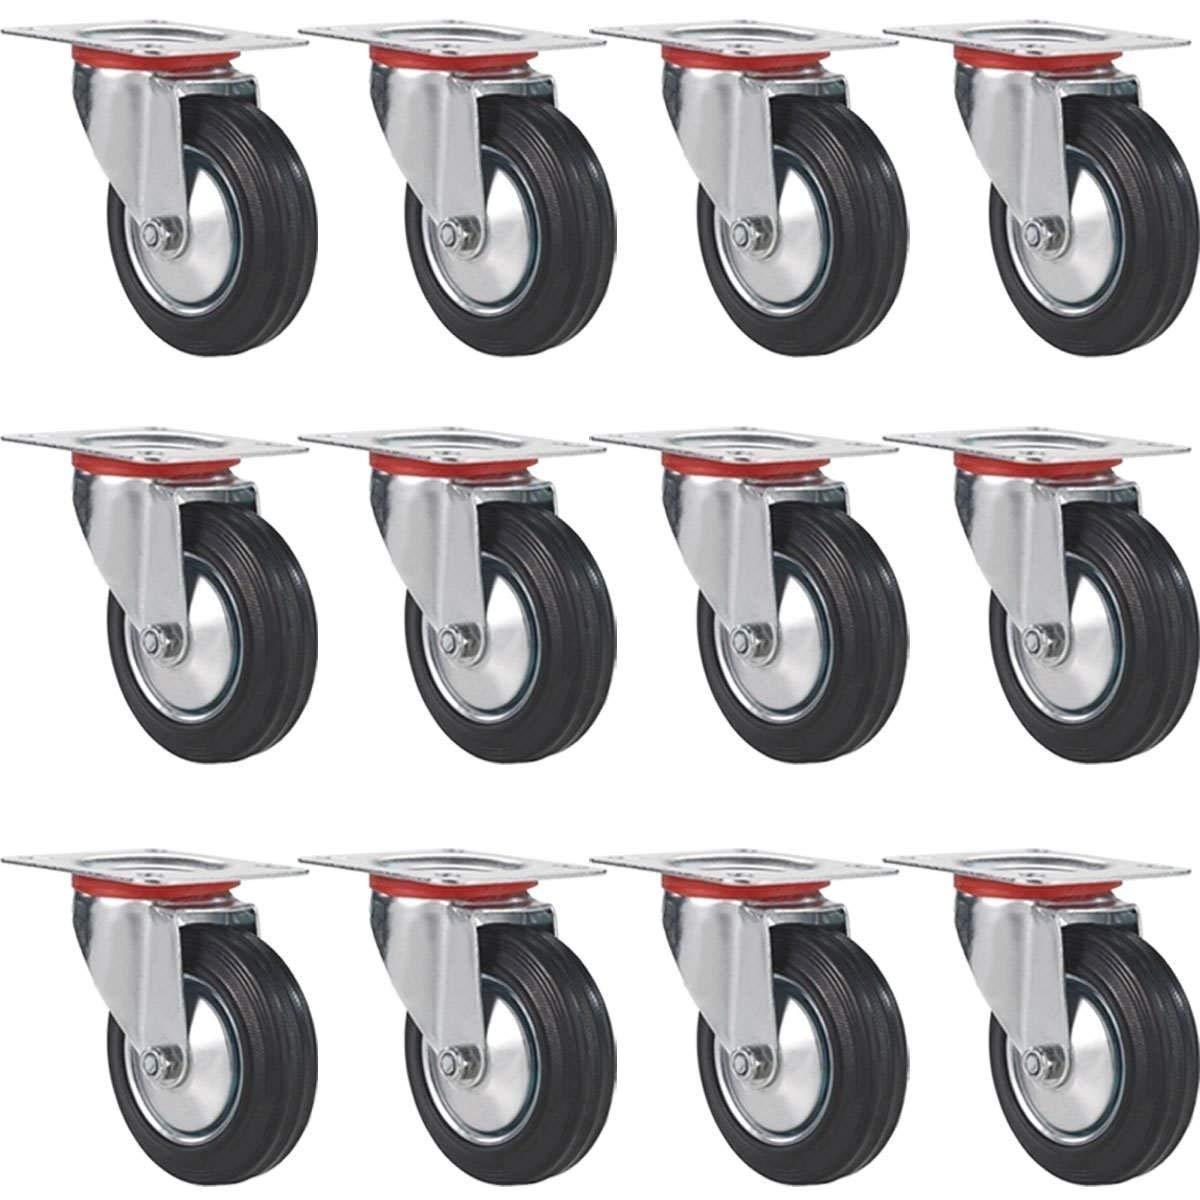 "FactorDuty 12 Pack 5"" Swivel Caster Wheels Rubber Base with Top Plate & Bearing Heavy Duty (5"" no brake)"